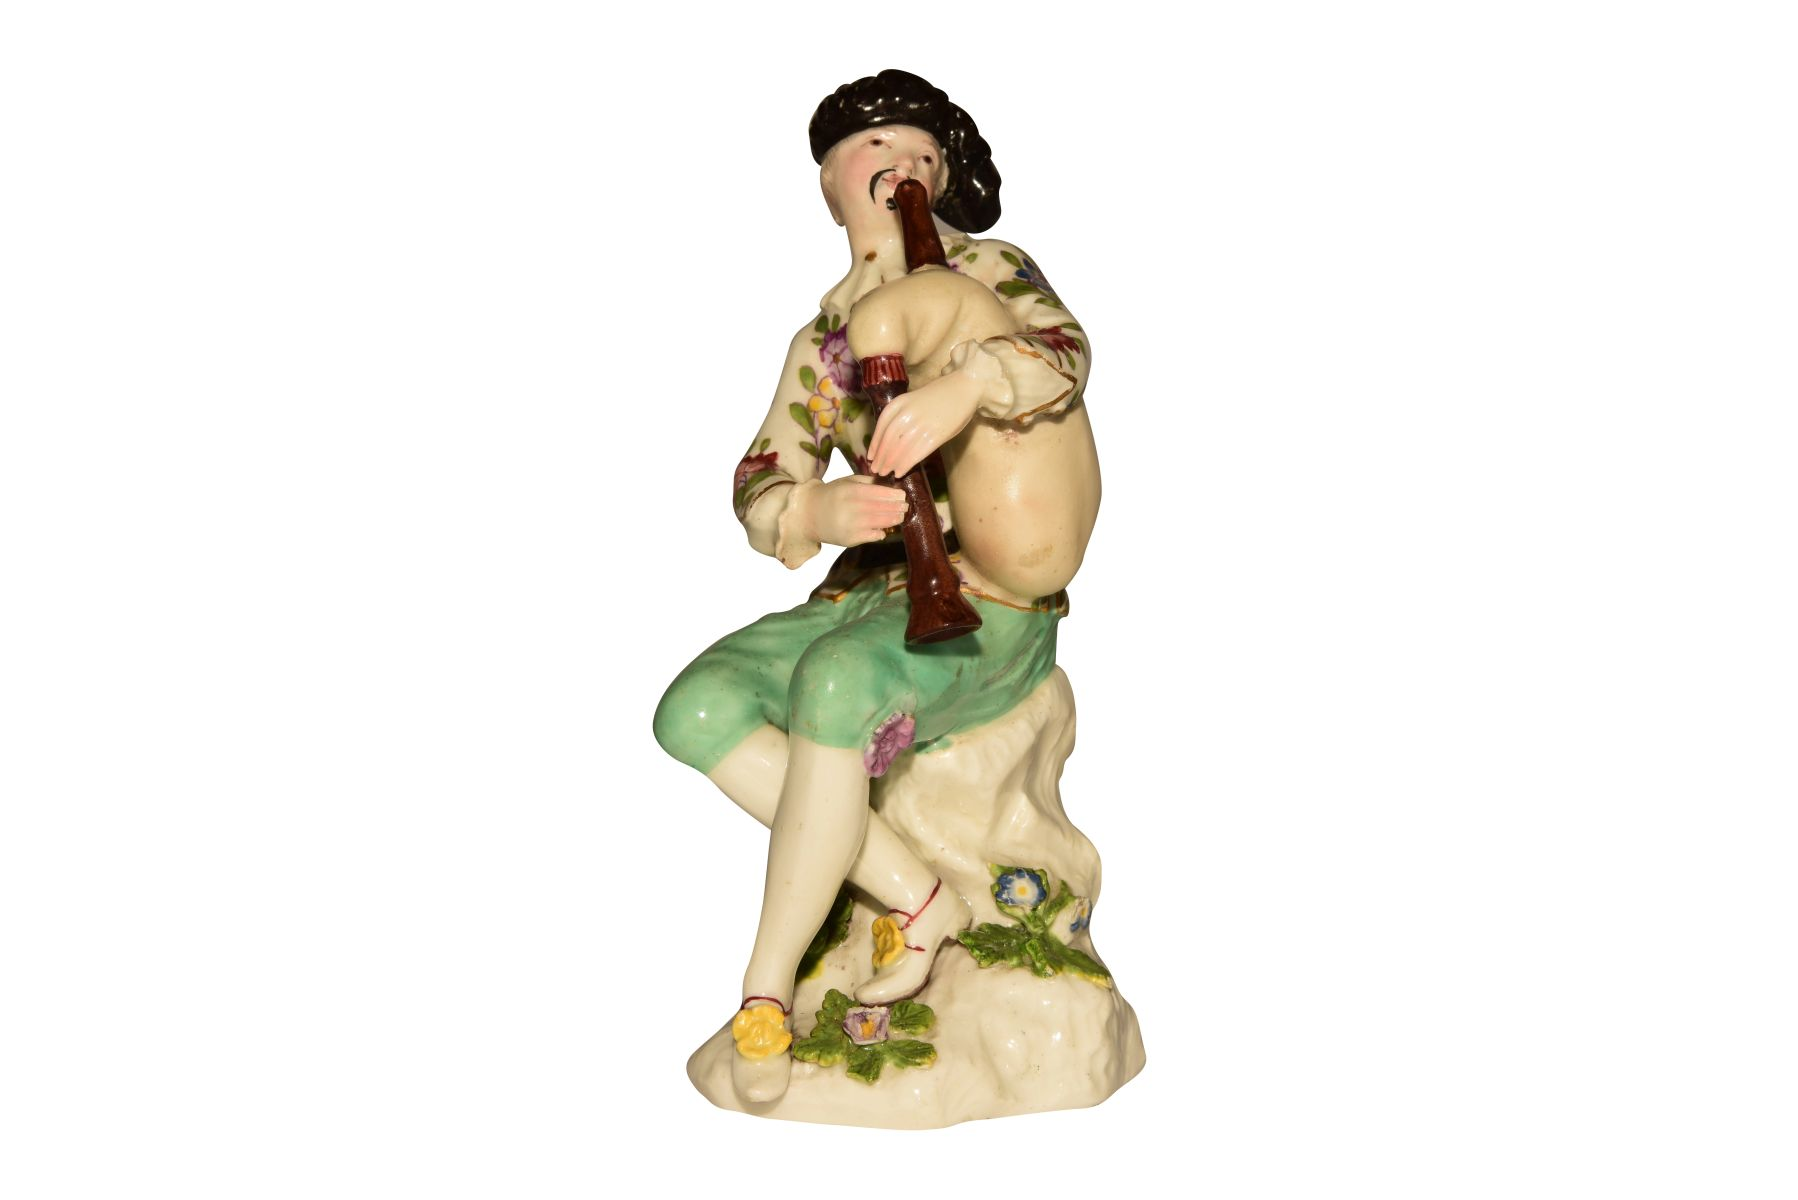 "#66 Harlequin with bagpipes Meissen 1745   ""Harlekin mit Dudelsack"" Meissen 1745 Image"